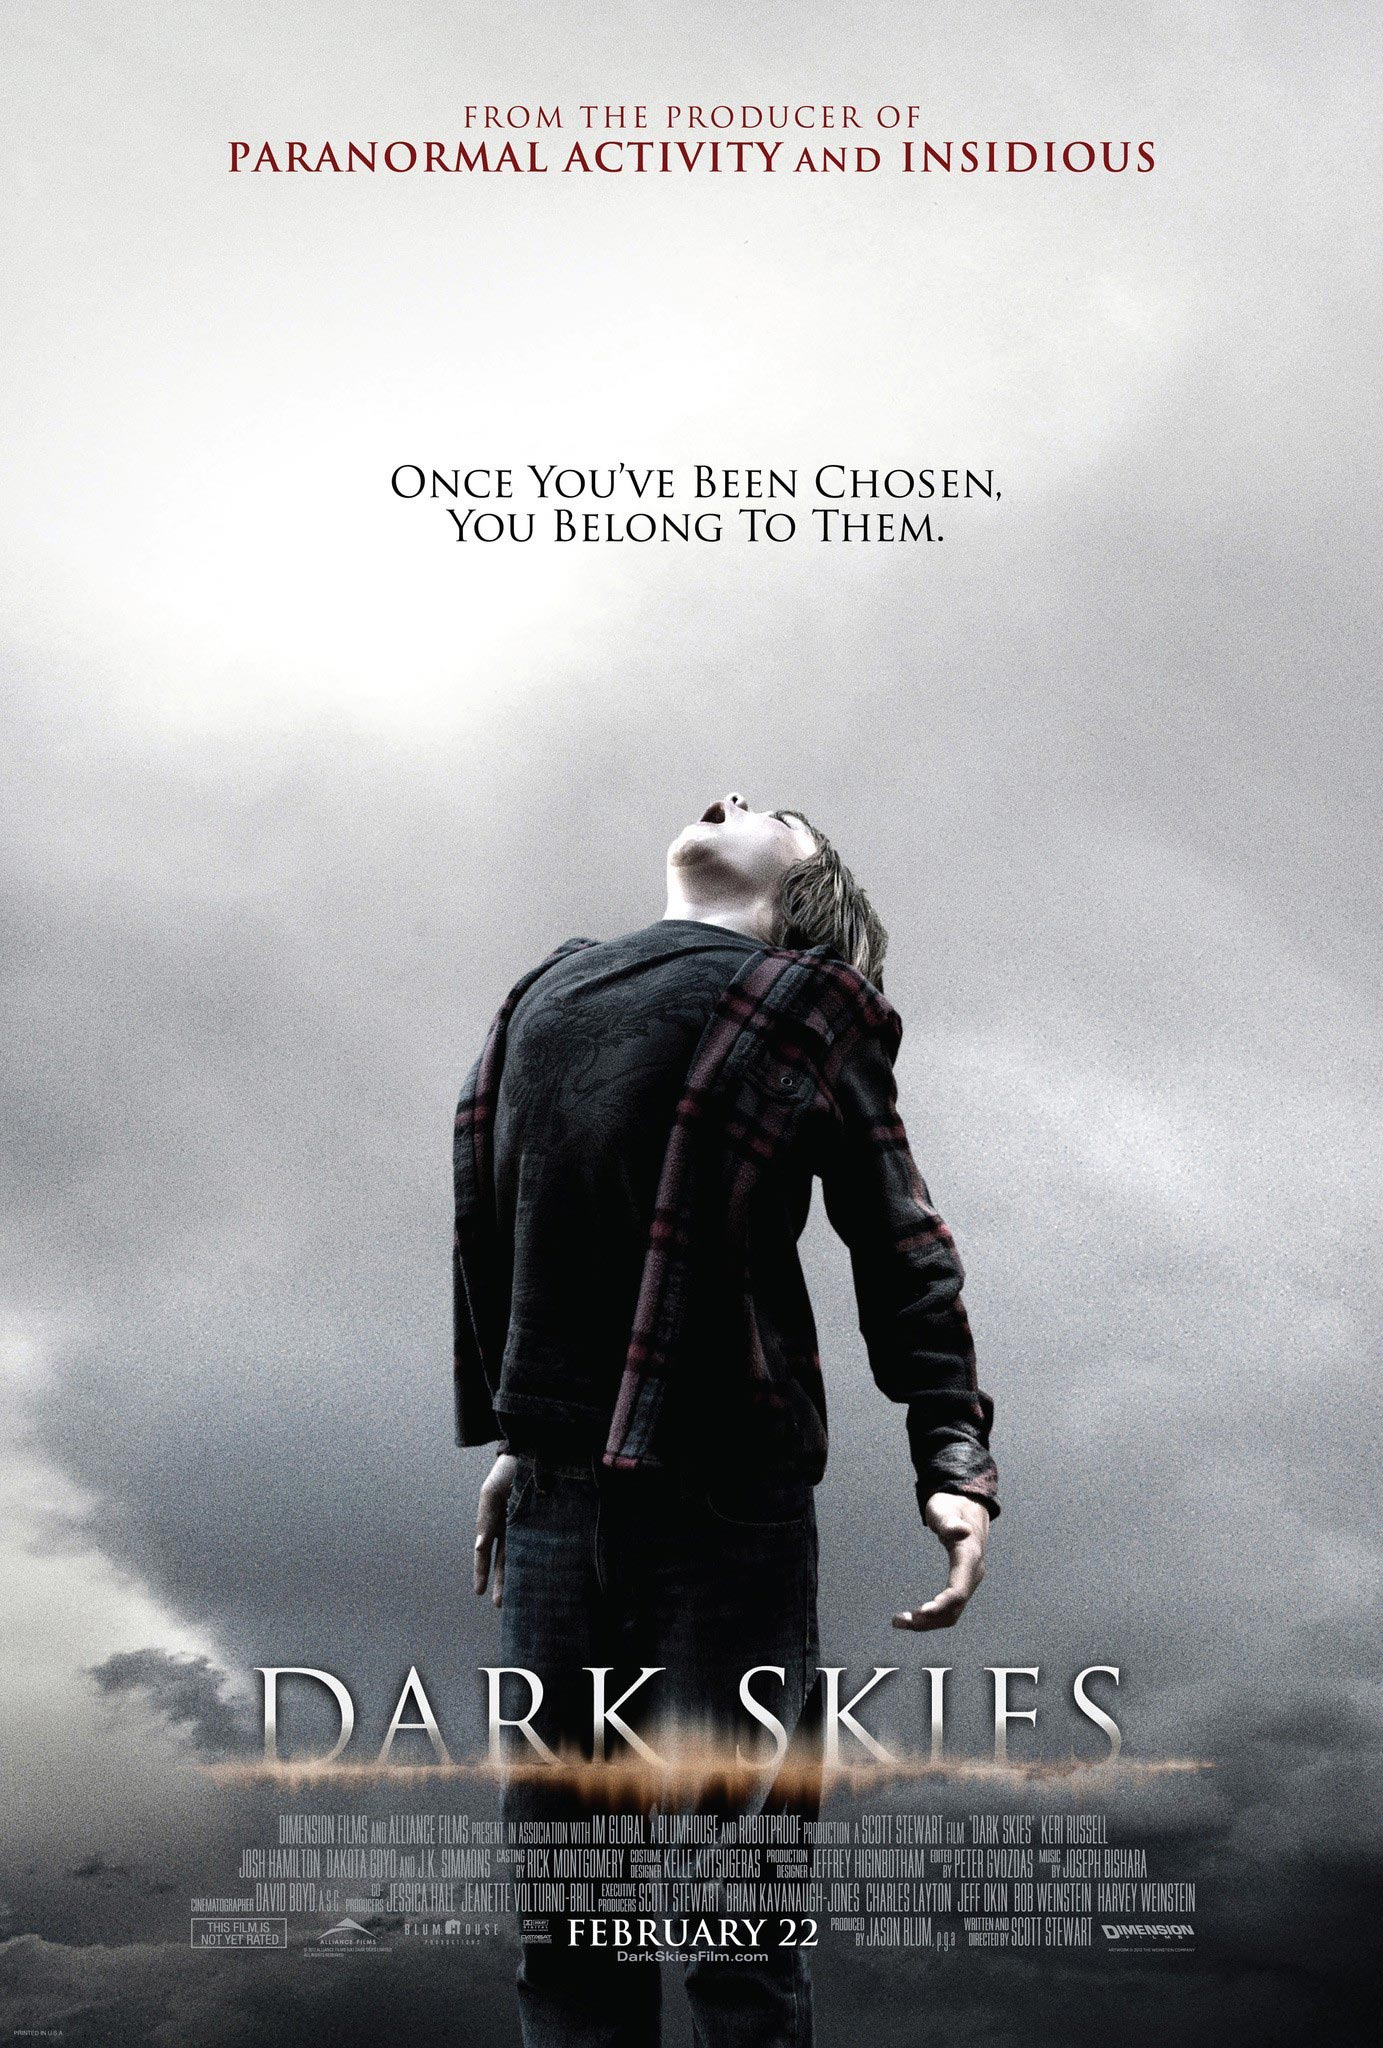 Dakota goyo dark skies kiss